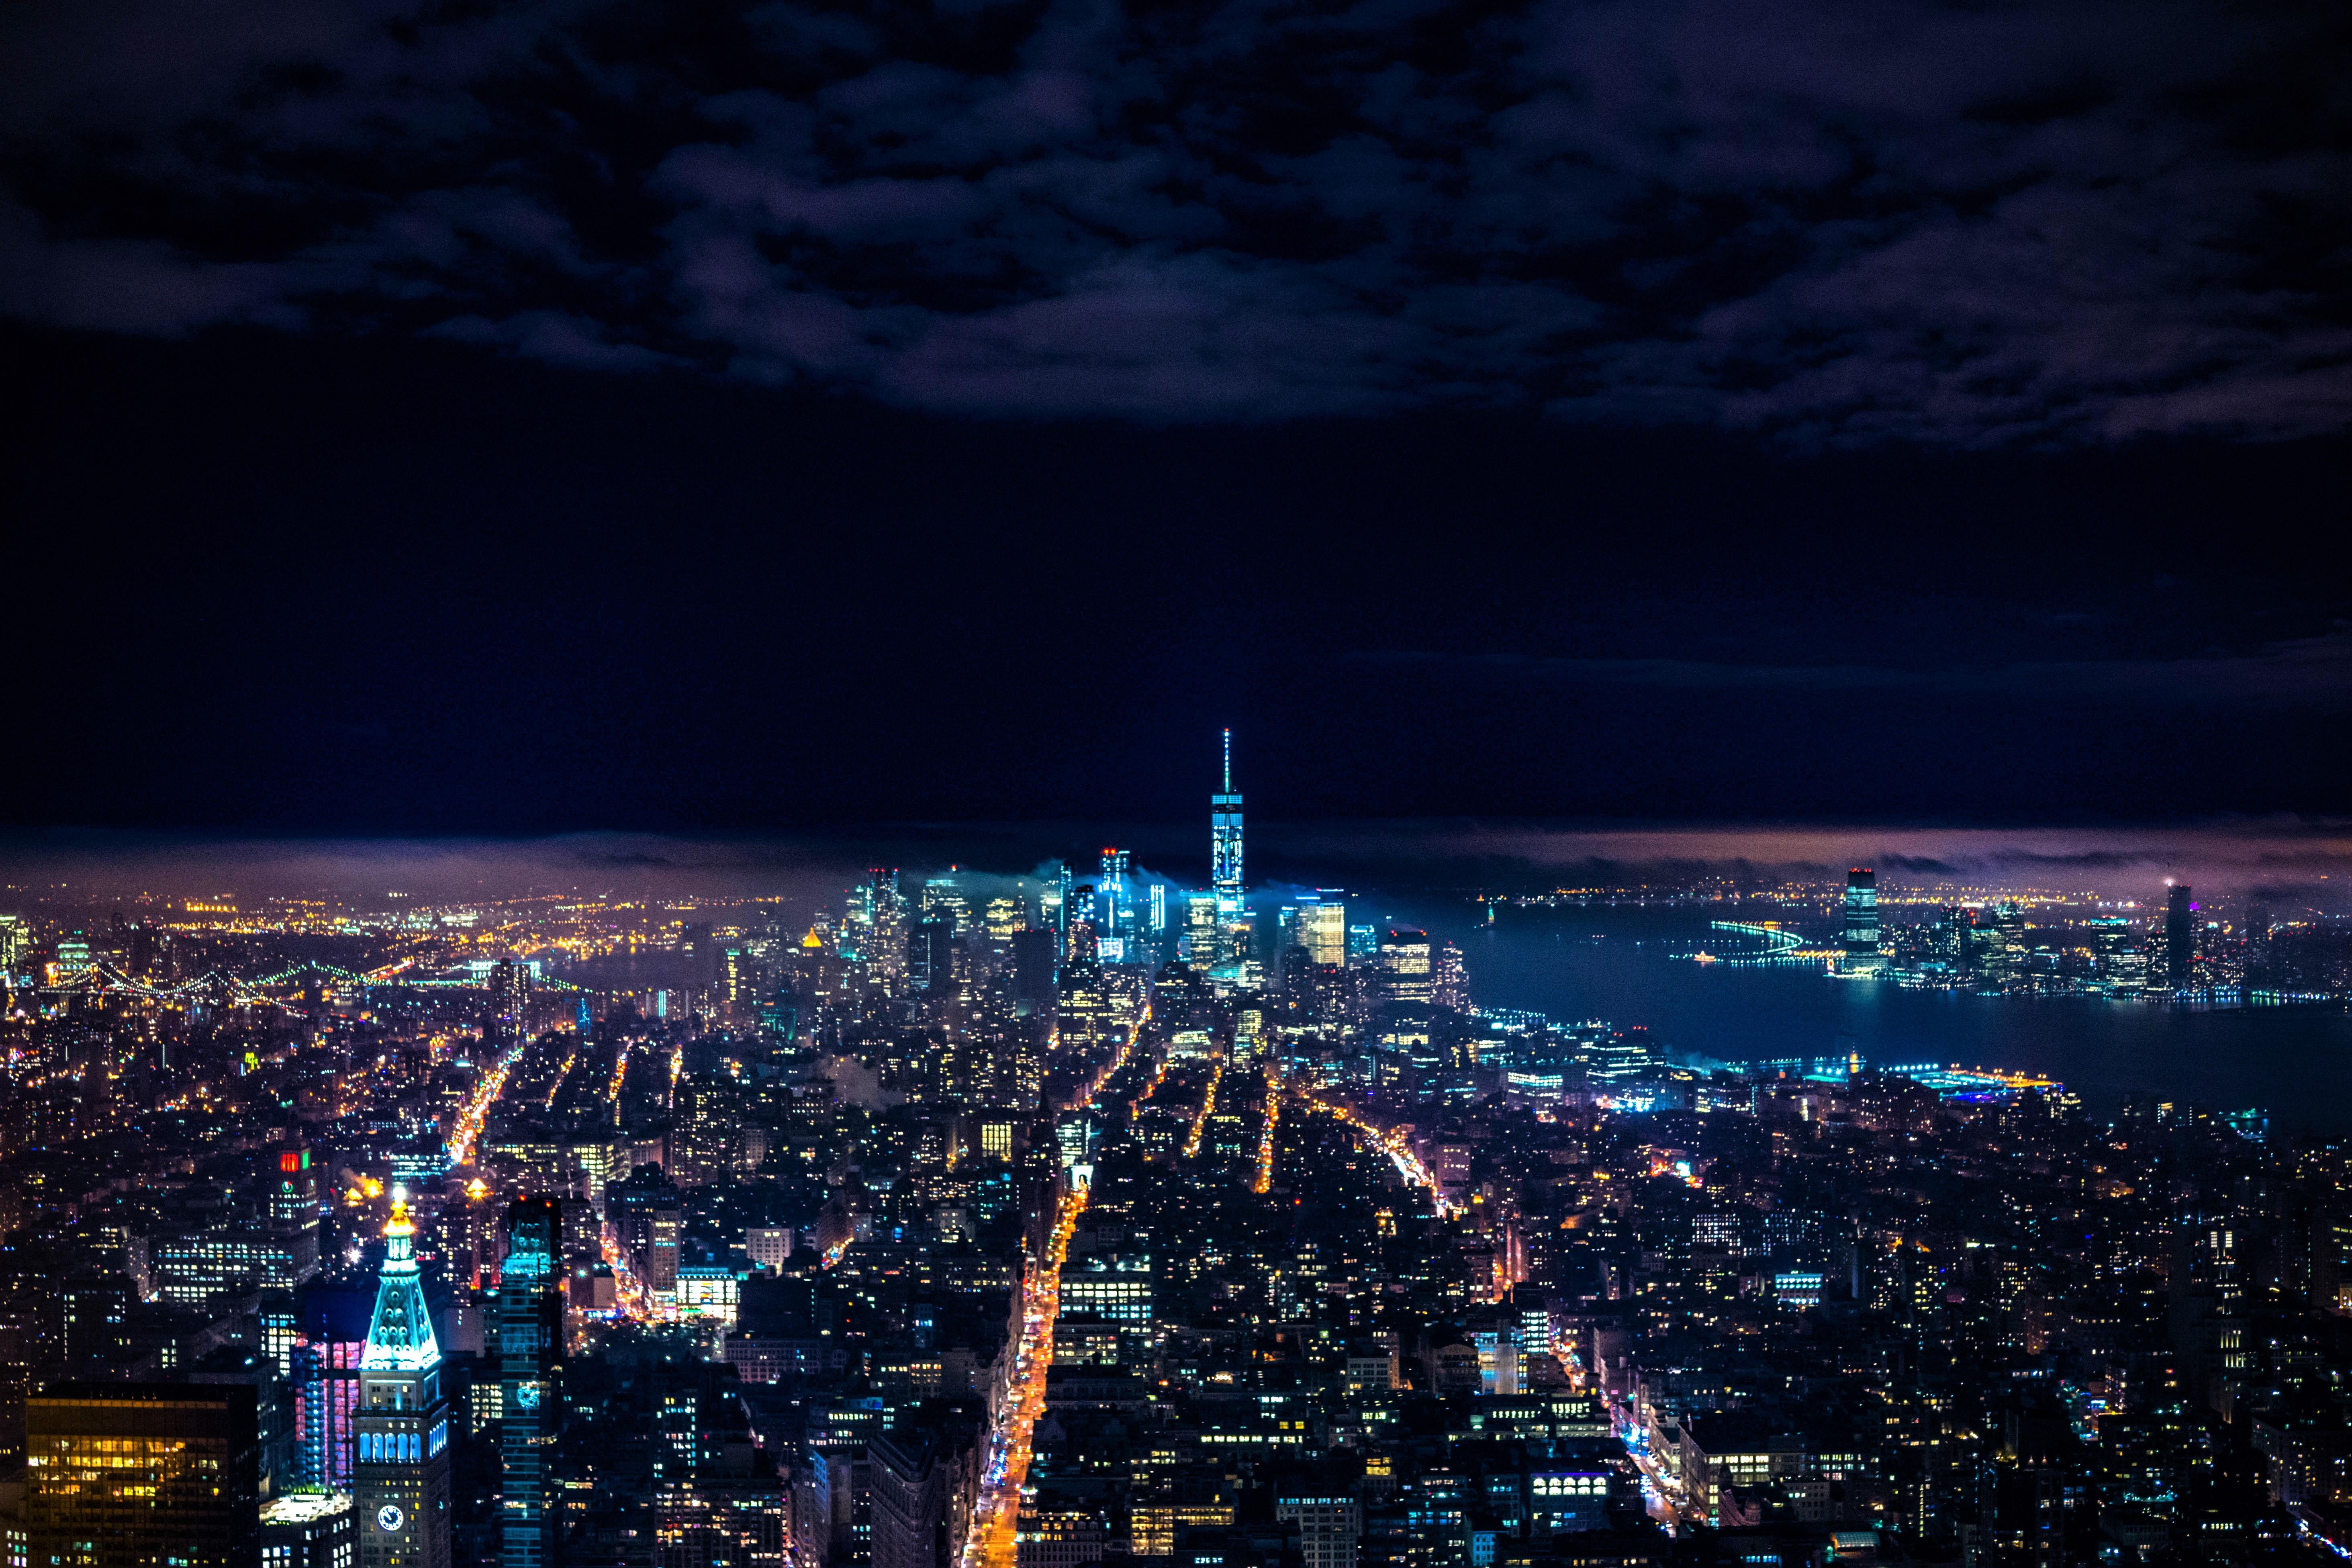 Nighttime In New York City 5k Retina Ultra Hd Wallpaper